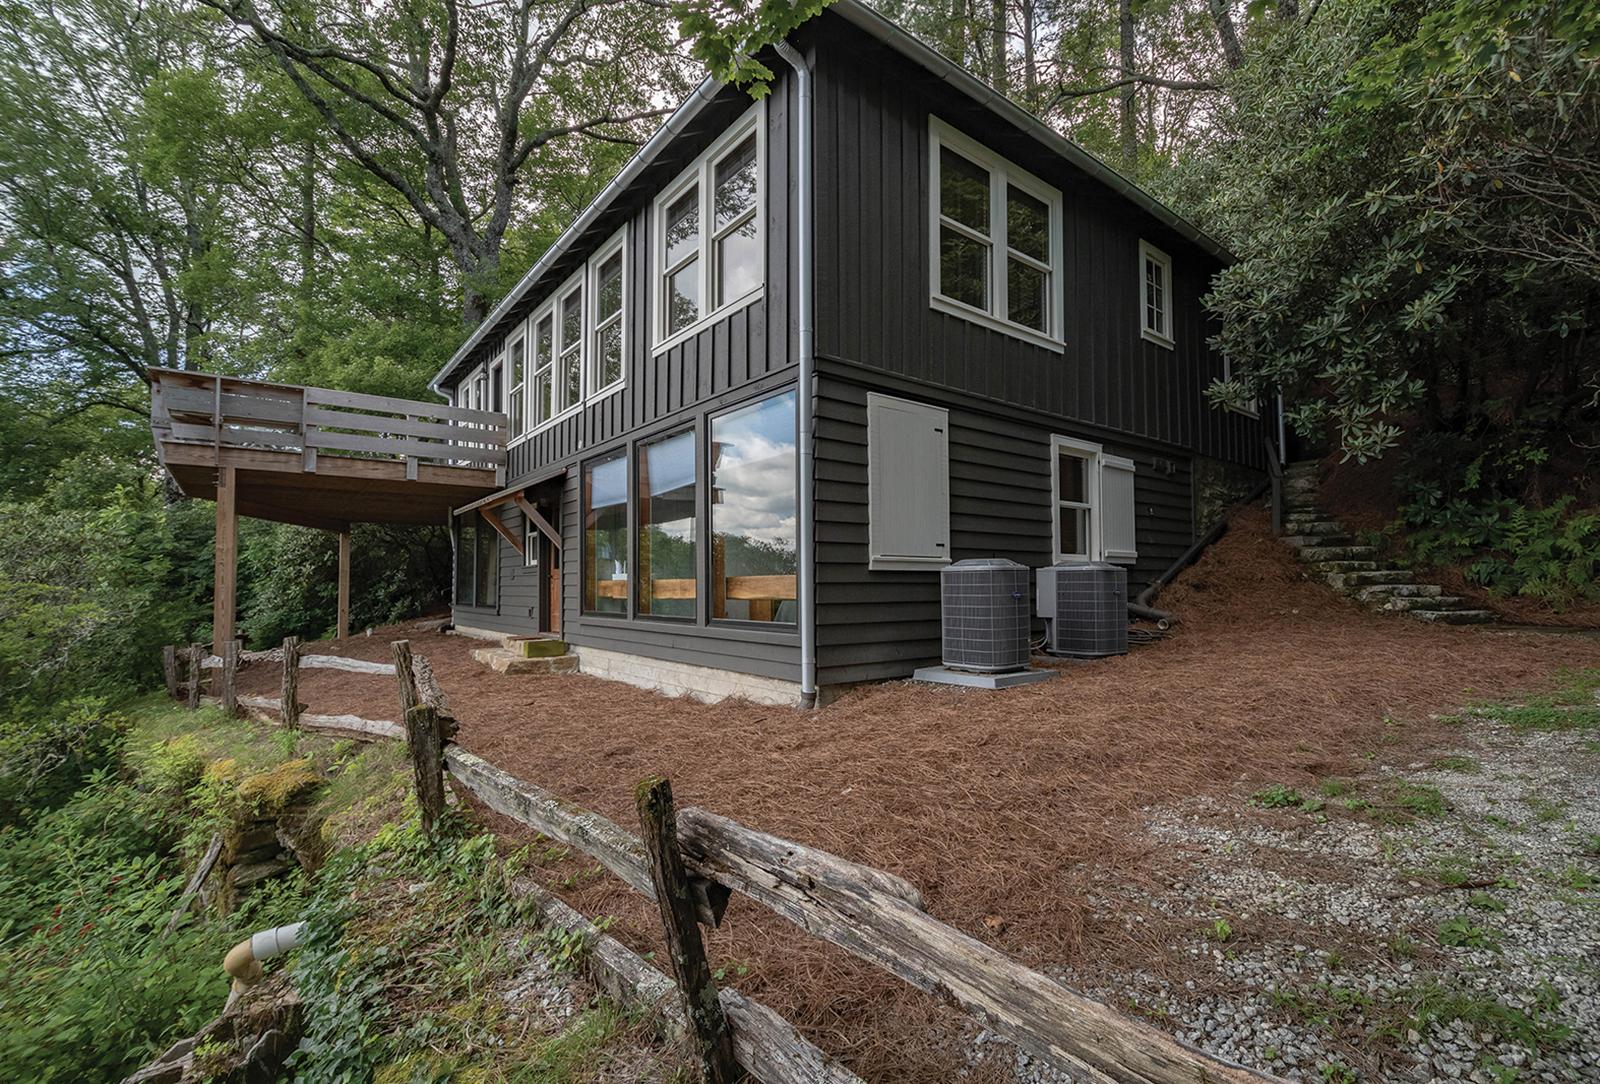 highlands nc home for sale exterior